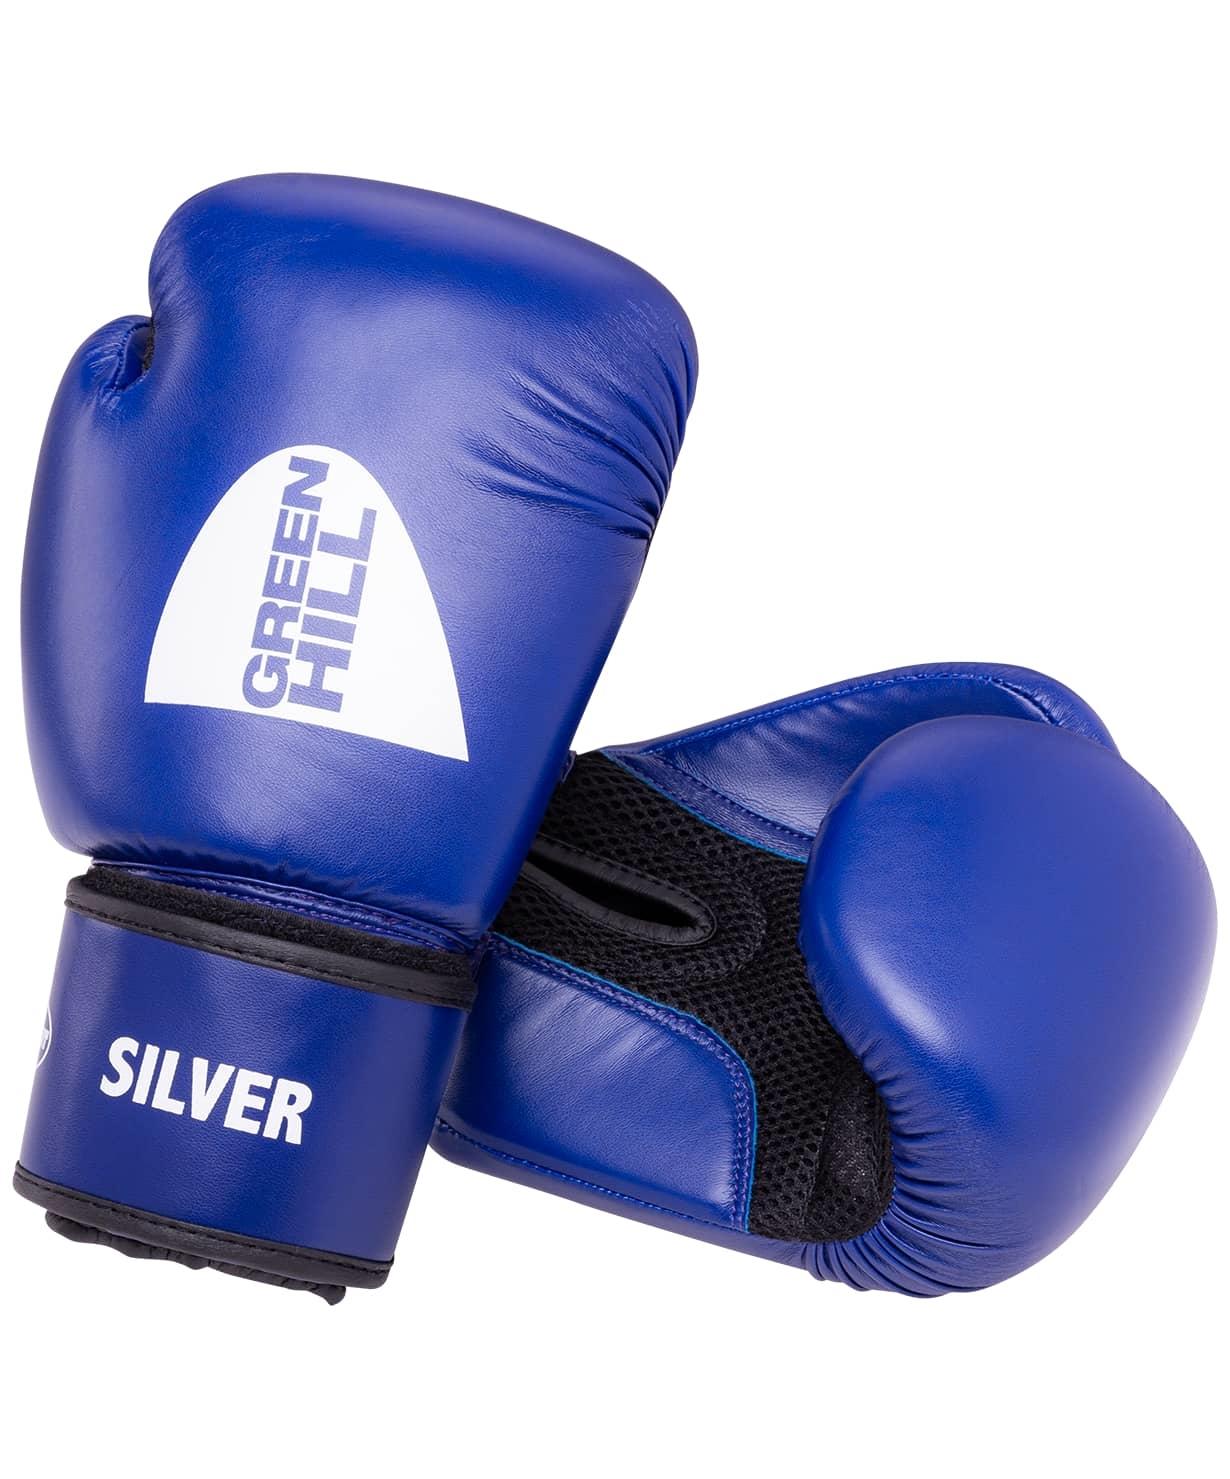 Перчатки боксерские SILVER BGS-2039, 14oz, к/з, синий